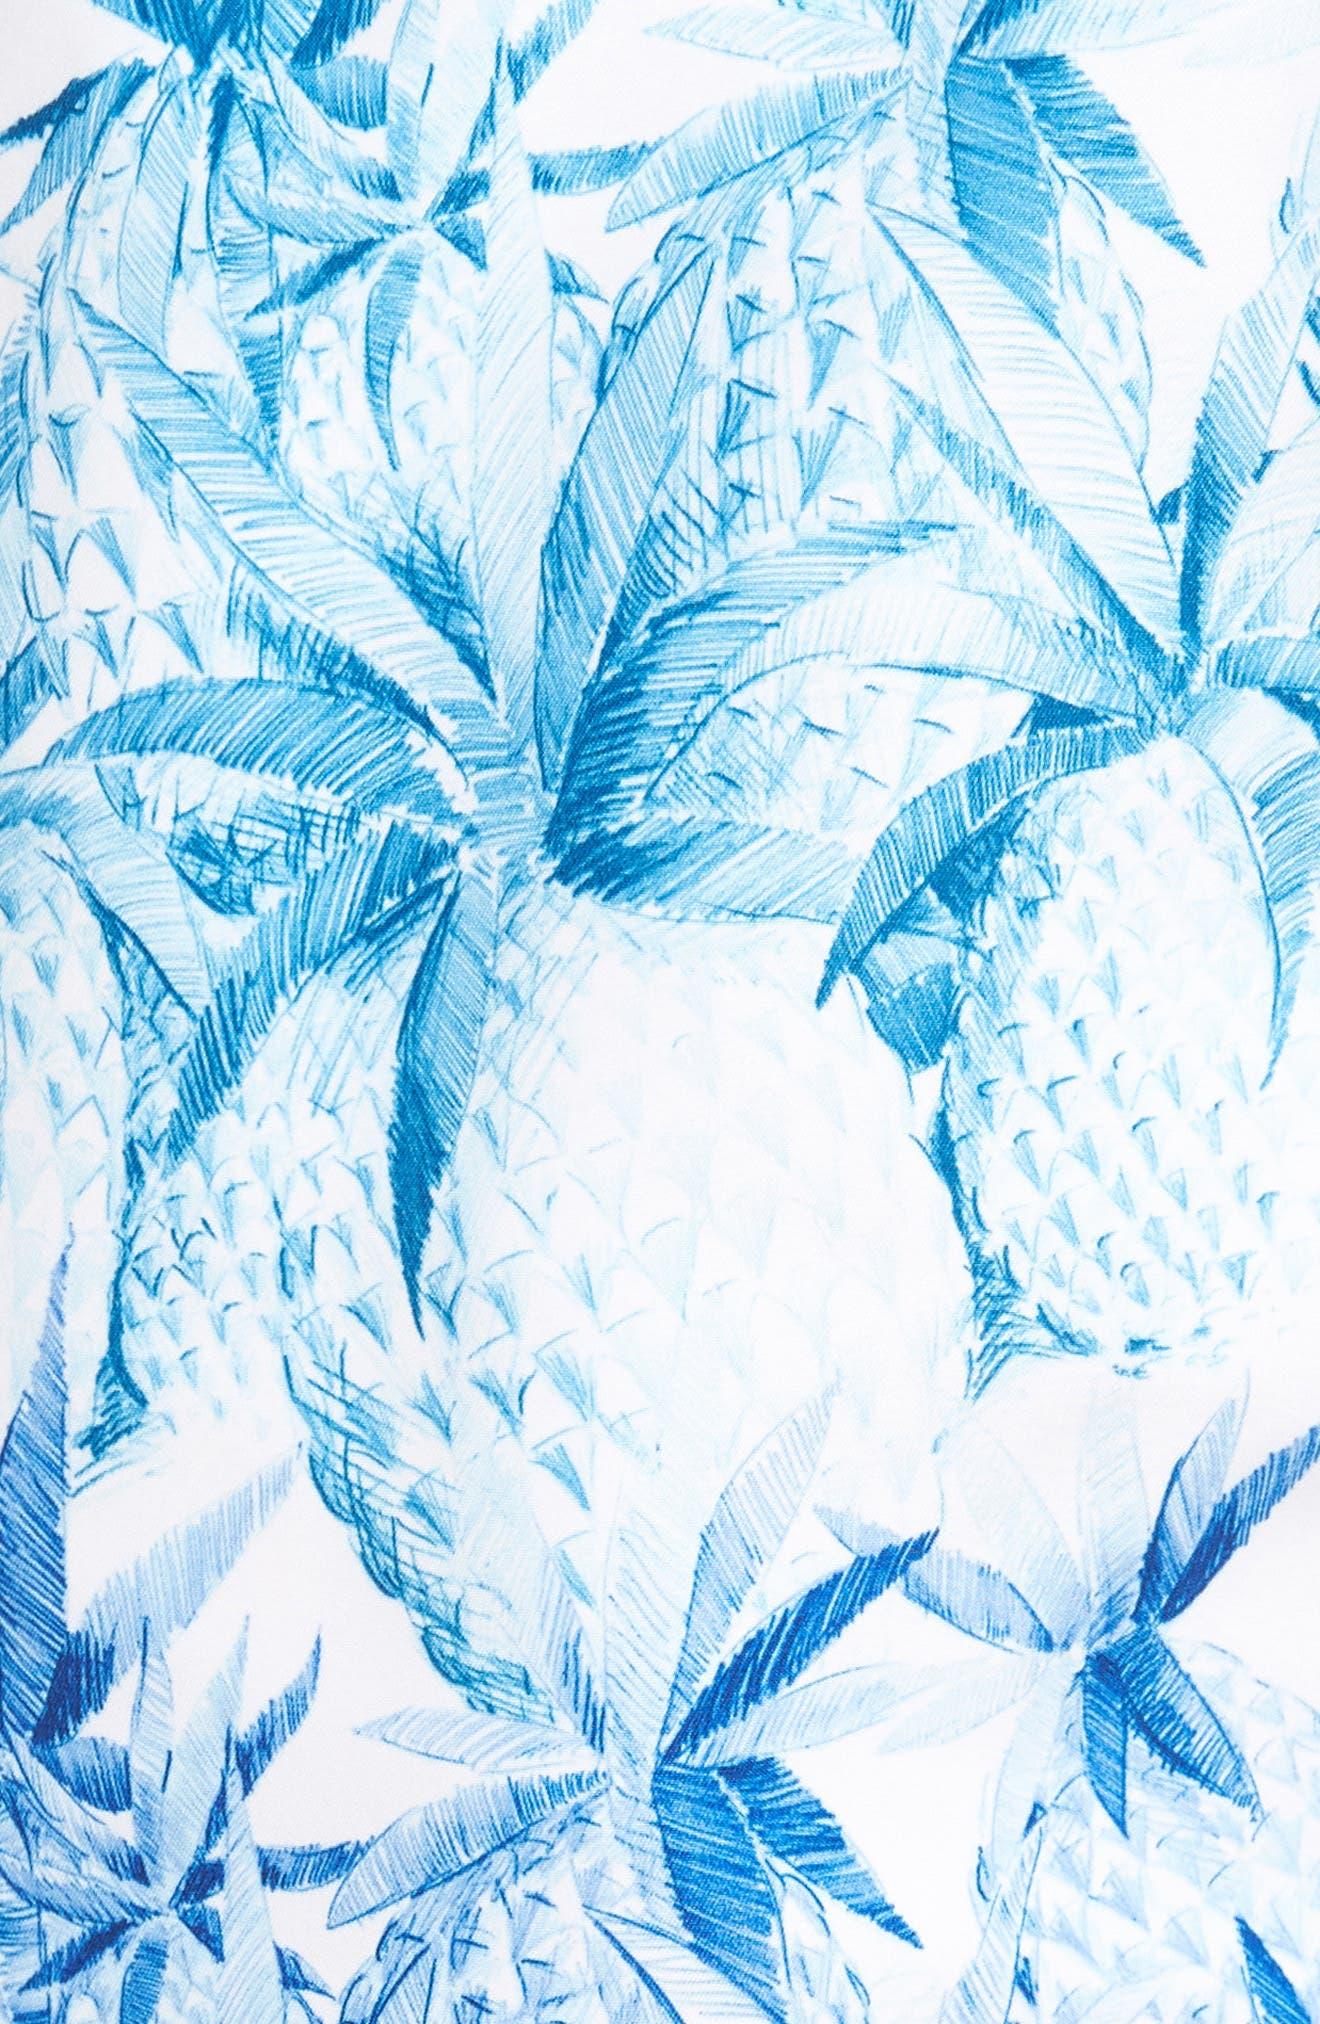 Naples Fruit of Tulum Swim Trunks,                             Alternate thumbnail 5, color,                             Santorini Blue